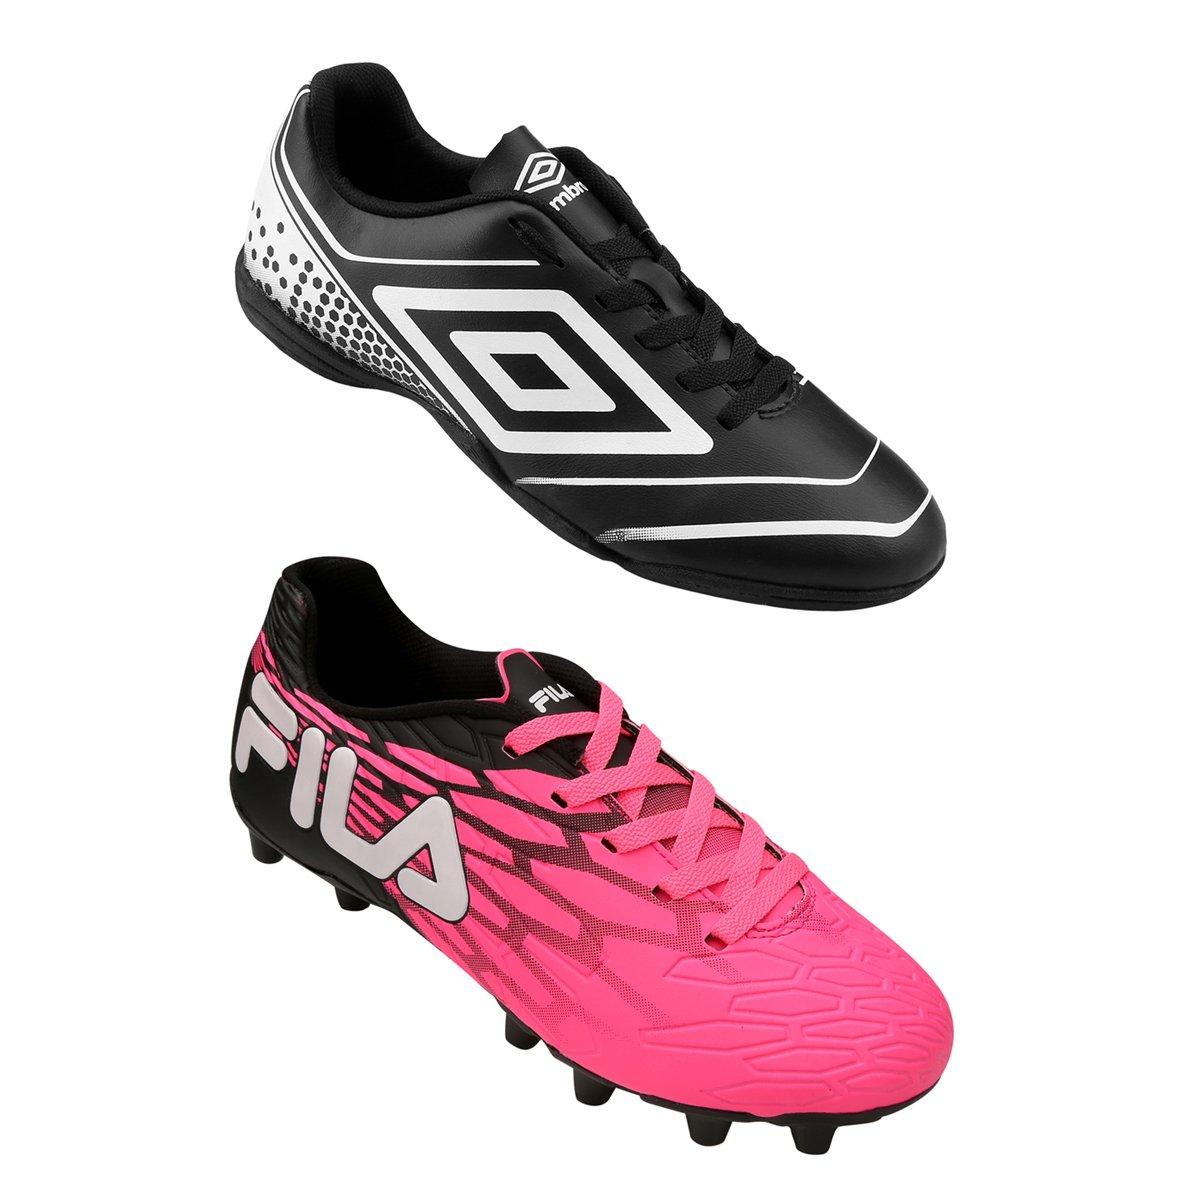 78cbb5c2c4ba3 Kit Chuteira Fila Snap Campo + Chuteira Umbro Gear Futsal - Compre Agora